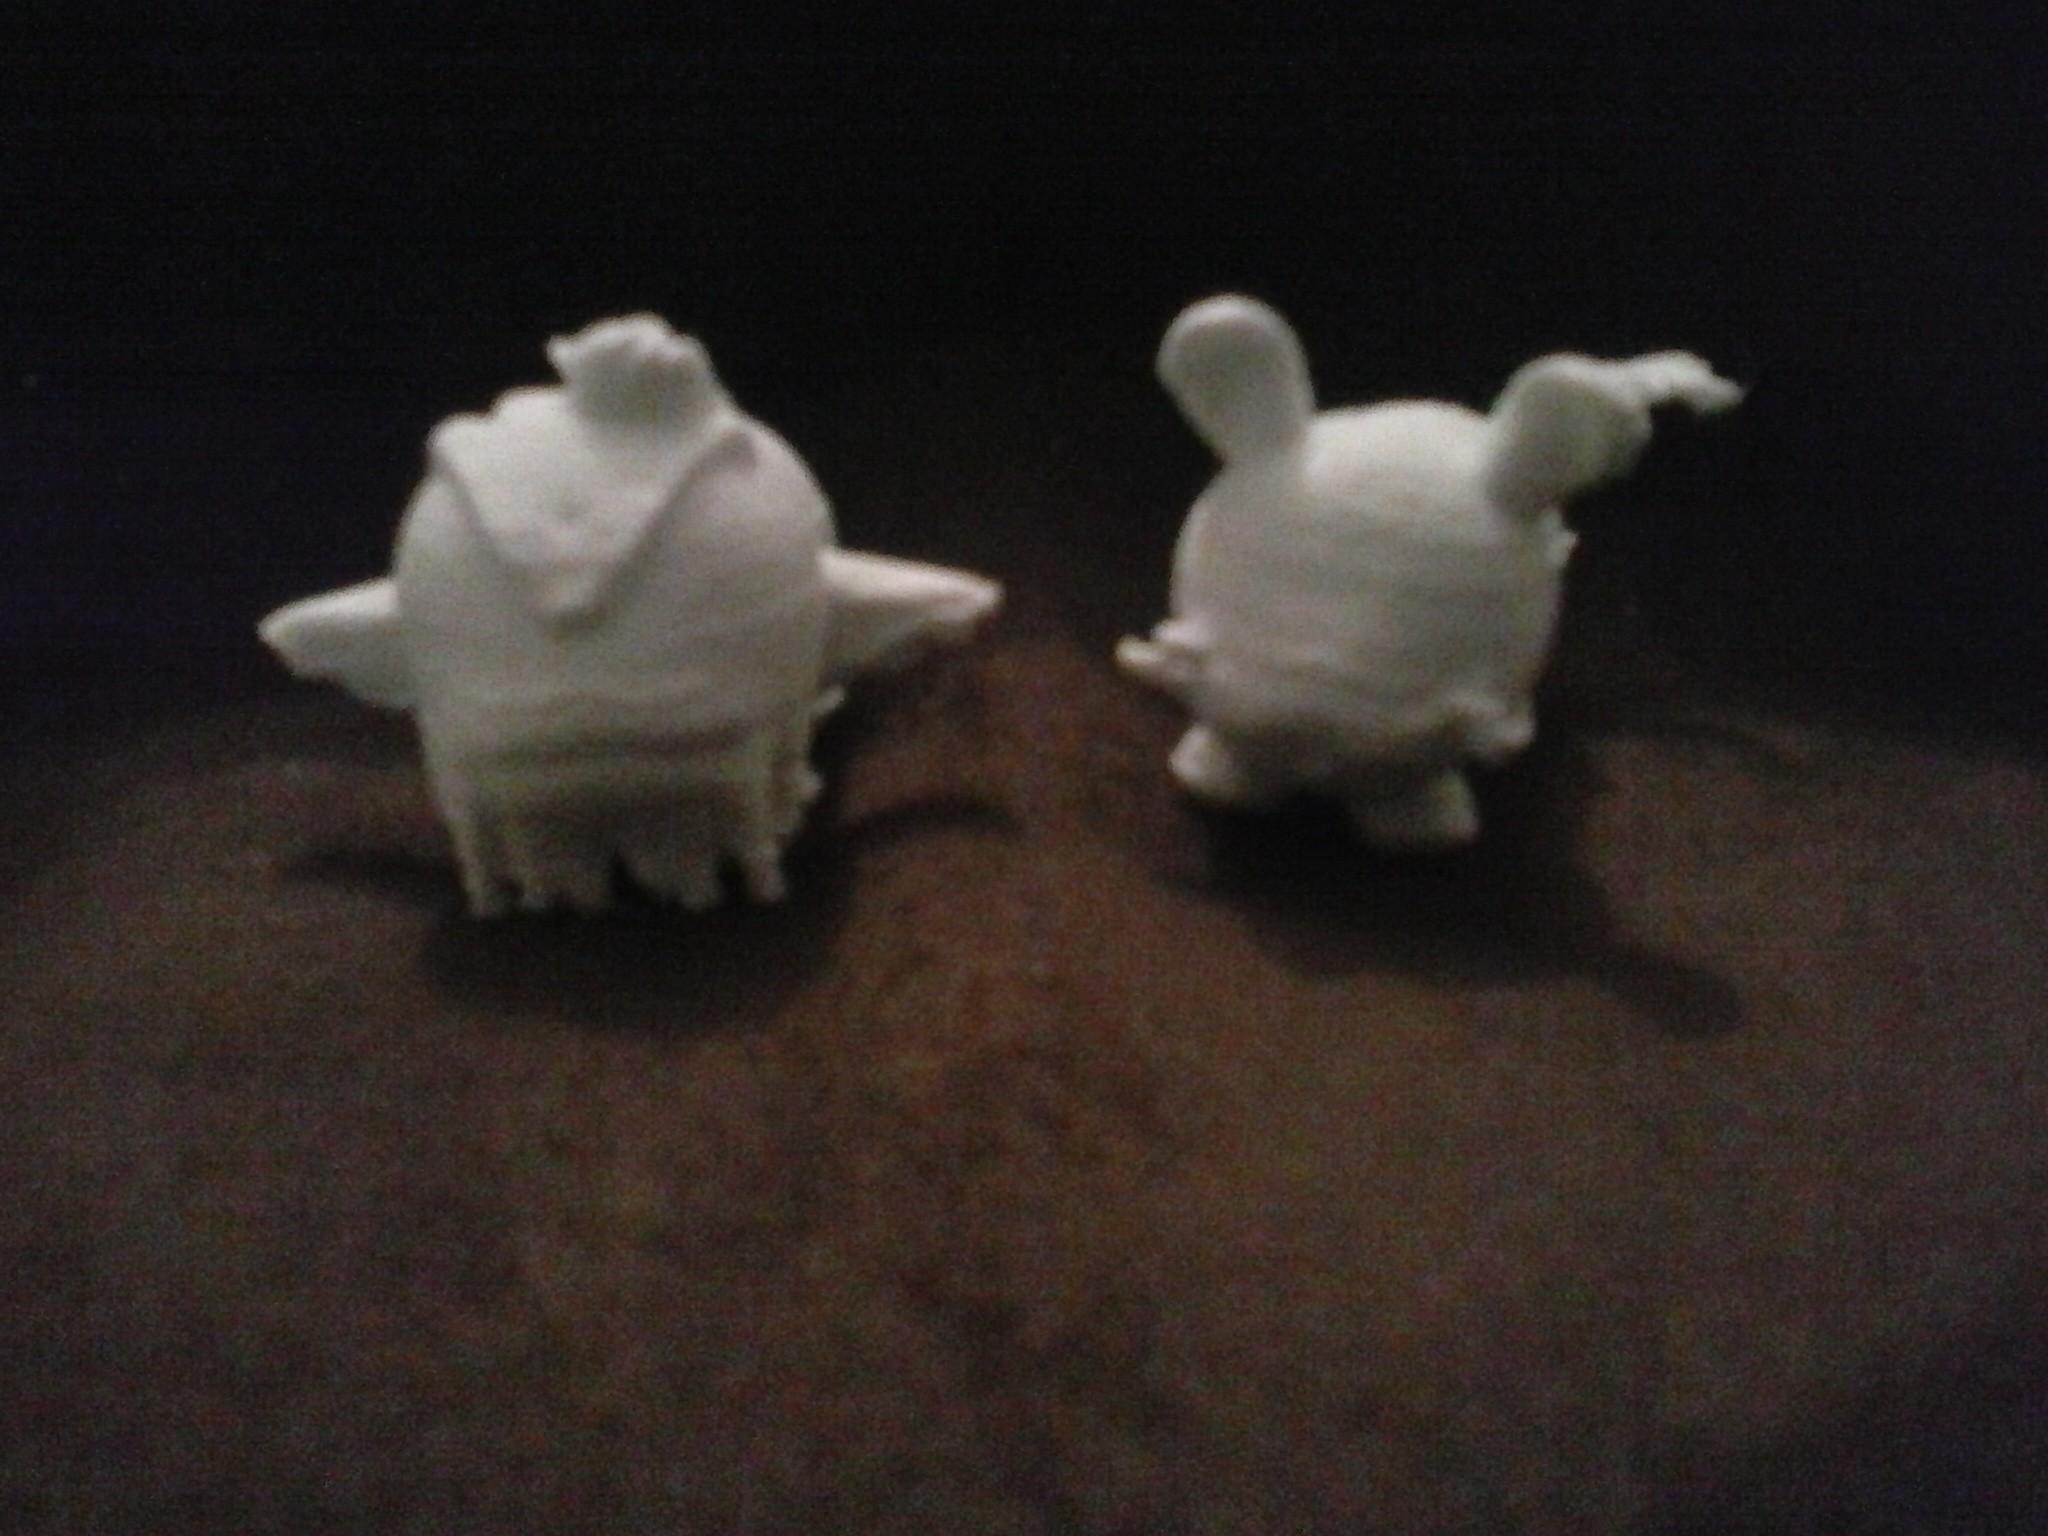 groudon dedenne.jpg Download STL file Pickachu • 3D printable design, Majin59